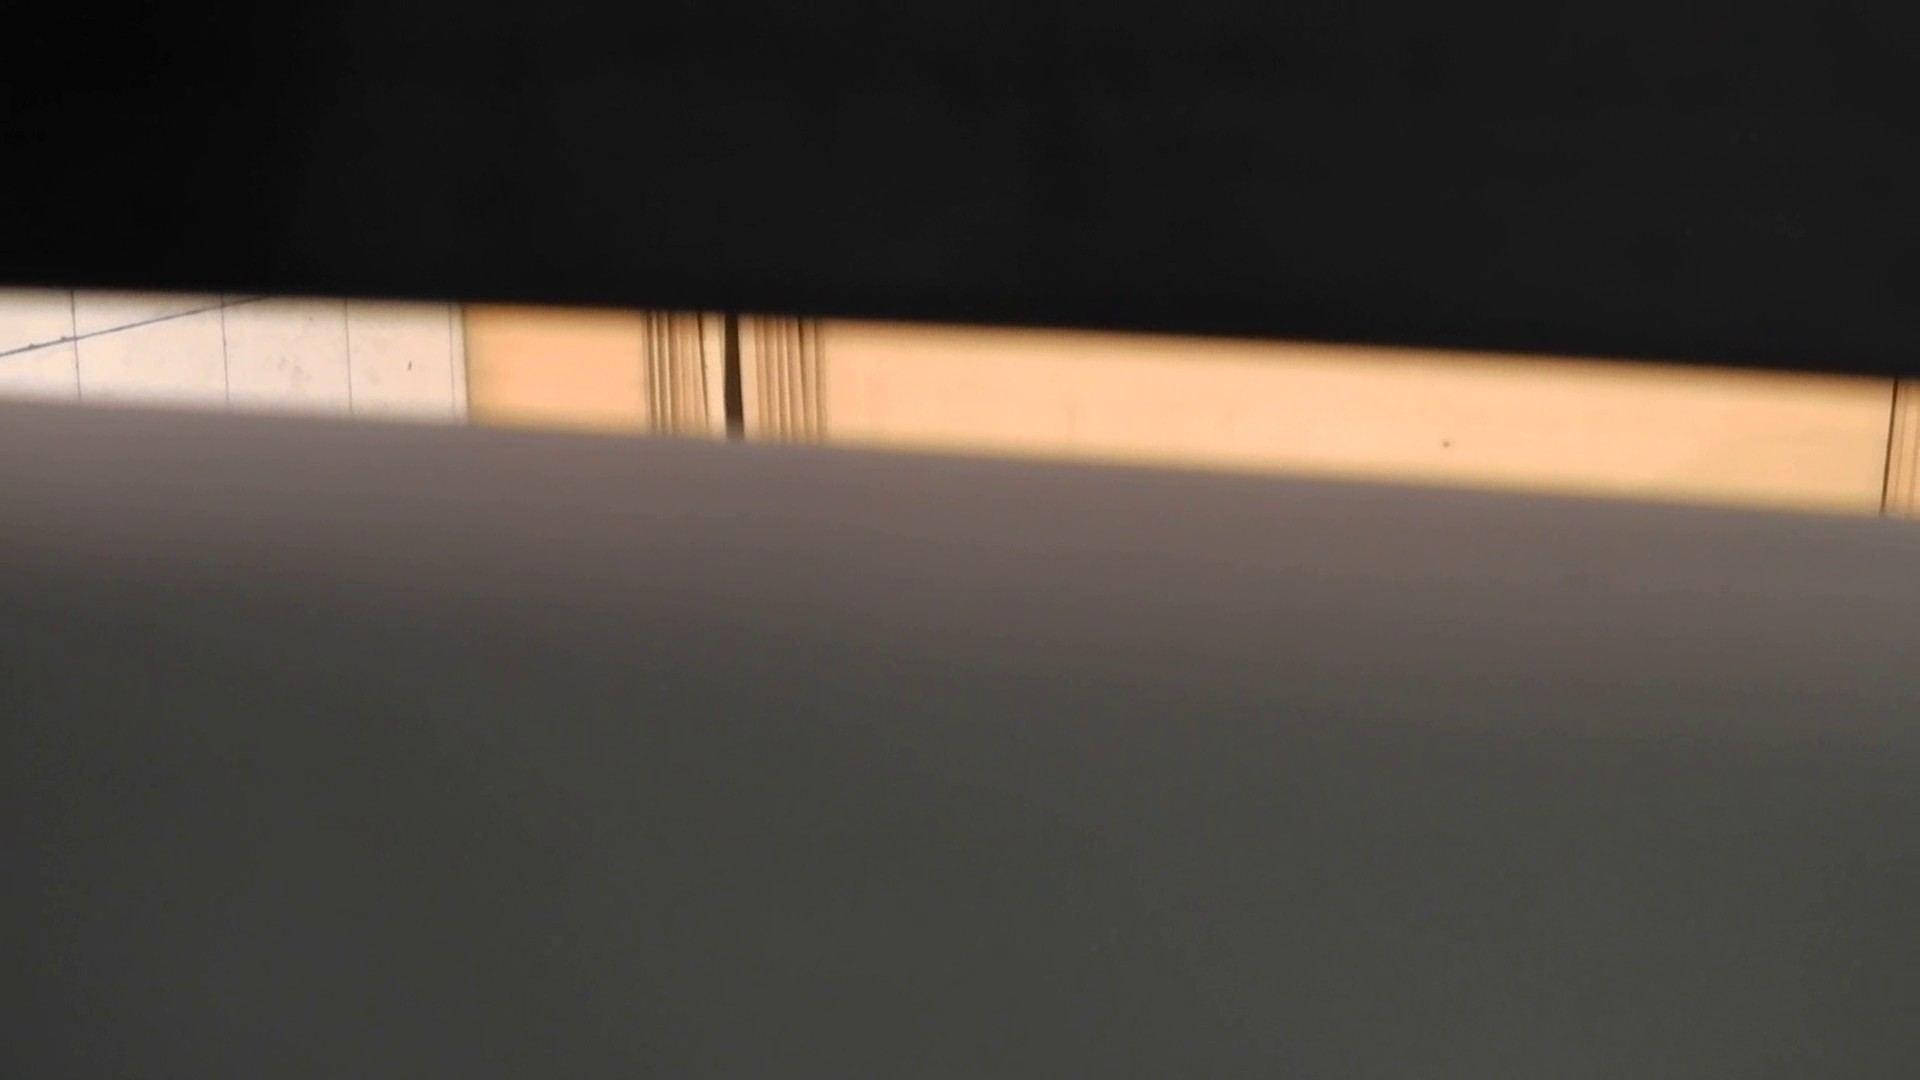 vol.25三十時間潜り、一つしか出会えない完璧桃尻編 byお銀 美人   洗面所  96pic 46